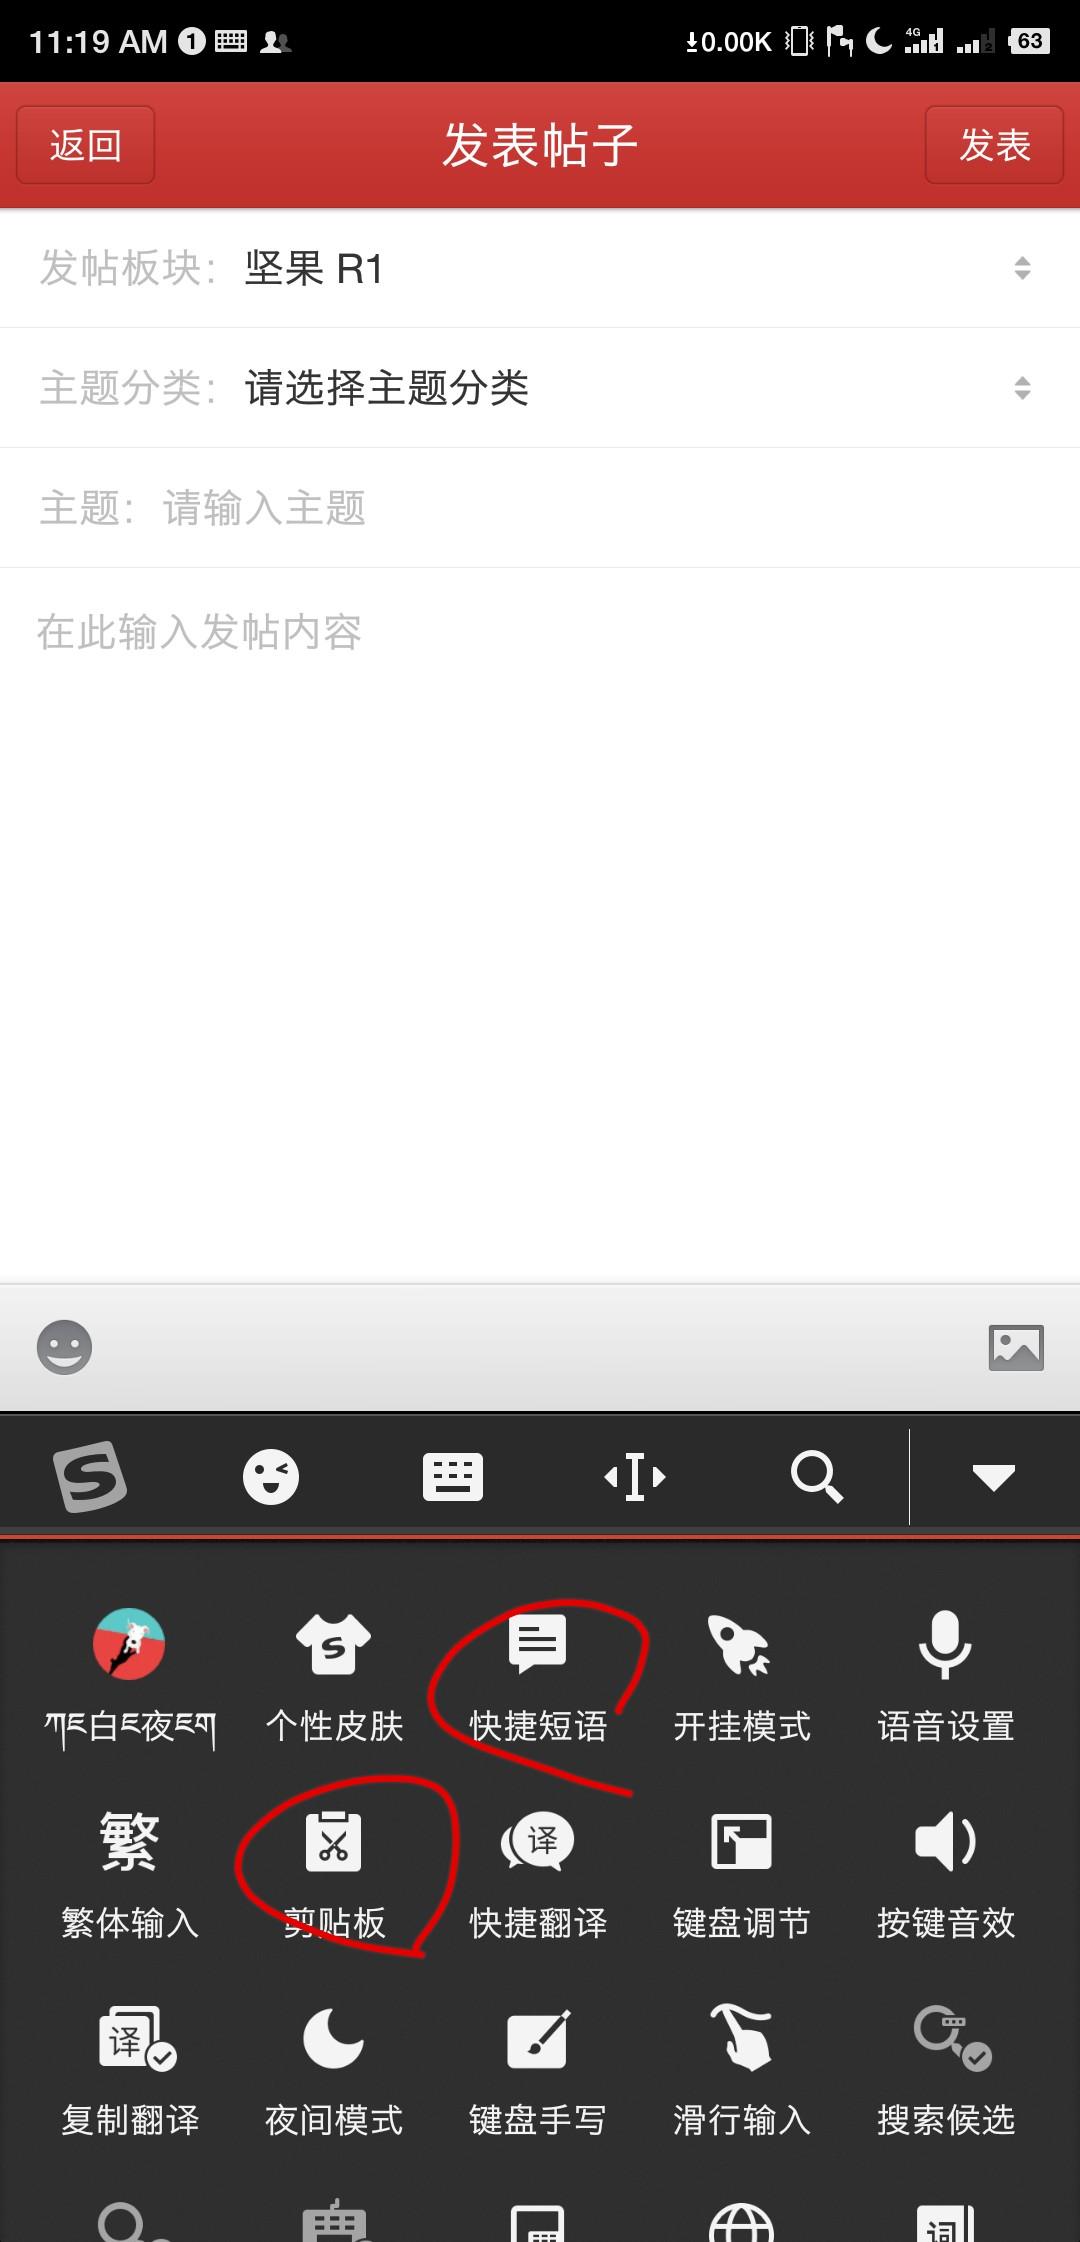 ??_Screenshot_2019-04-10-11-19-52-608_??????.png